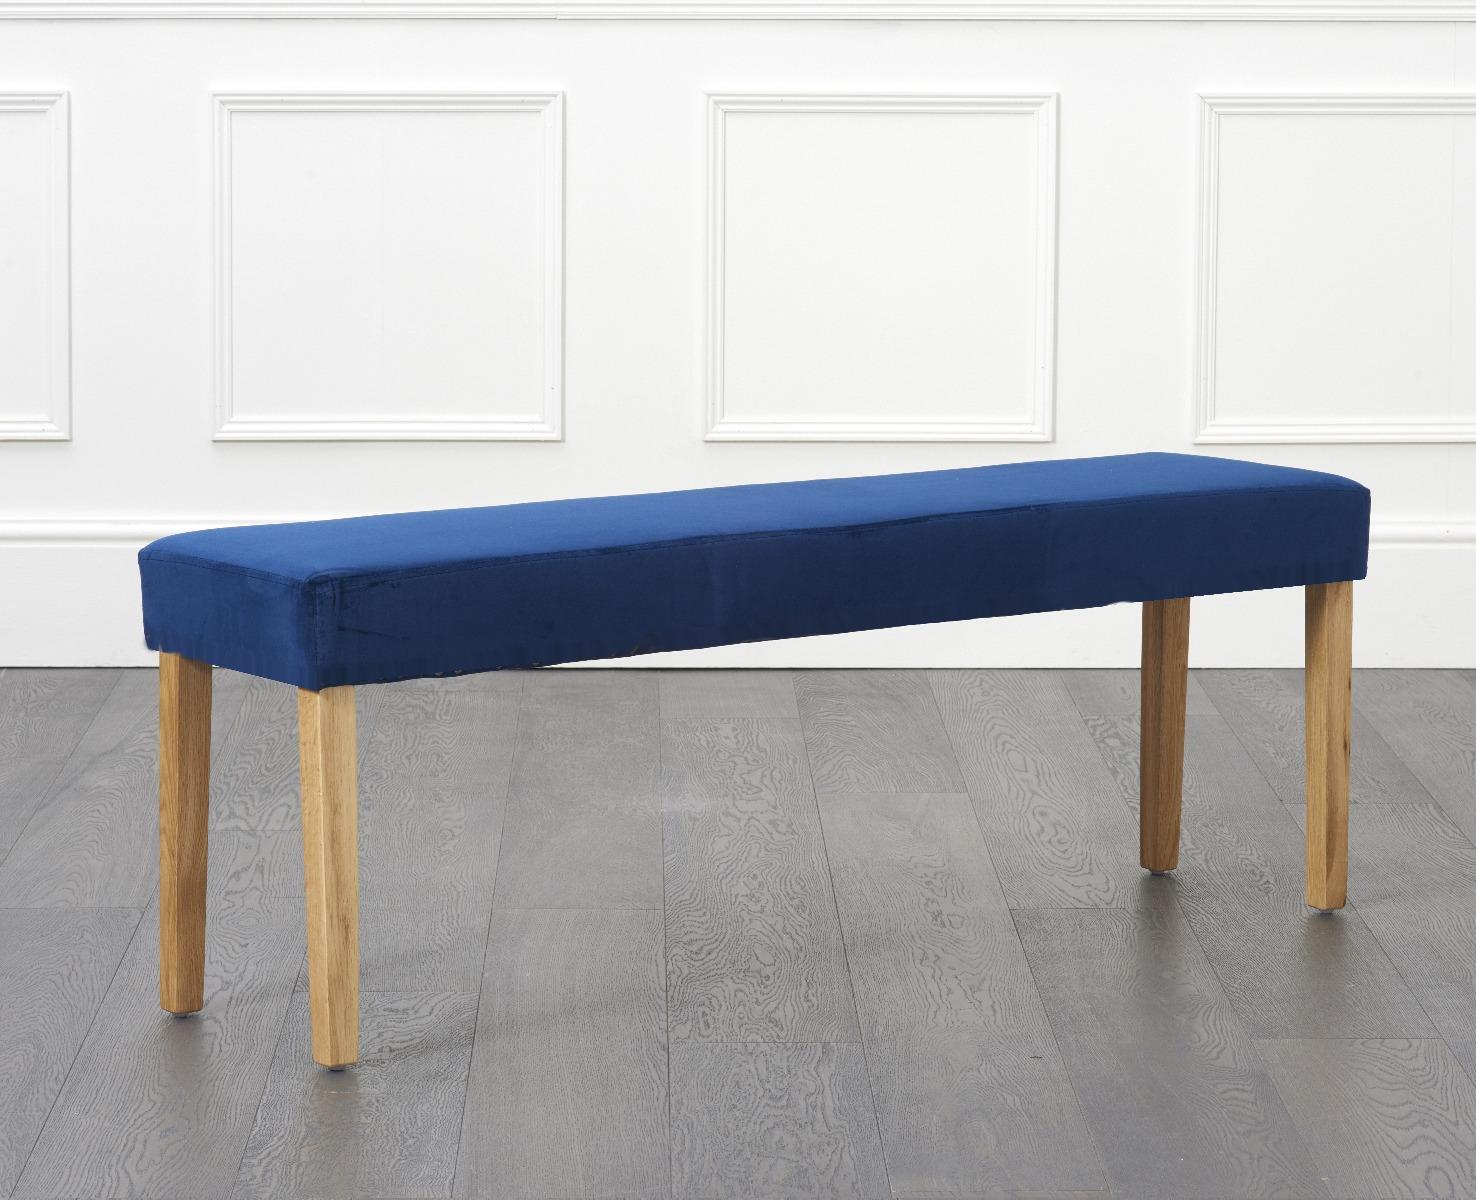 Admirable Mia Large Velvet Blue Bench Unemploymentrelief Wooden Chair Designs For Living Room Unemploymentrelieforg